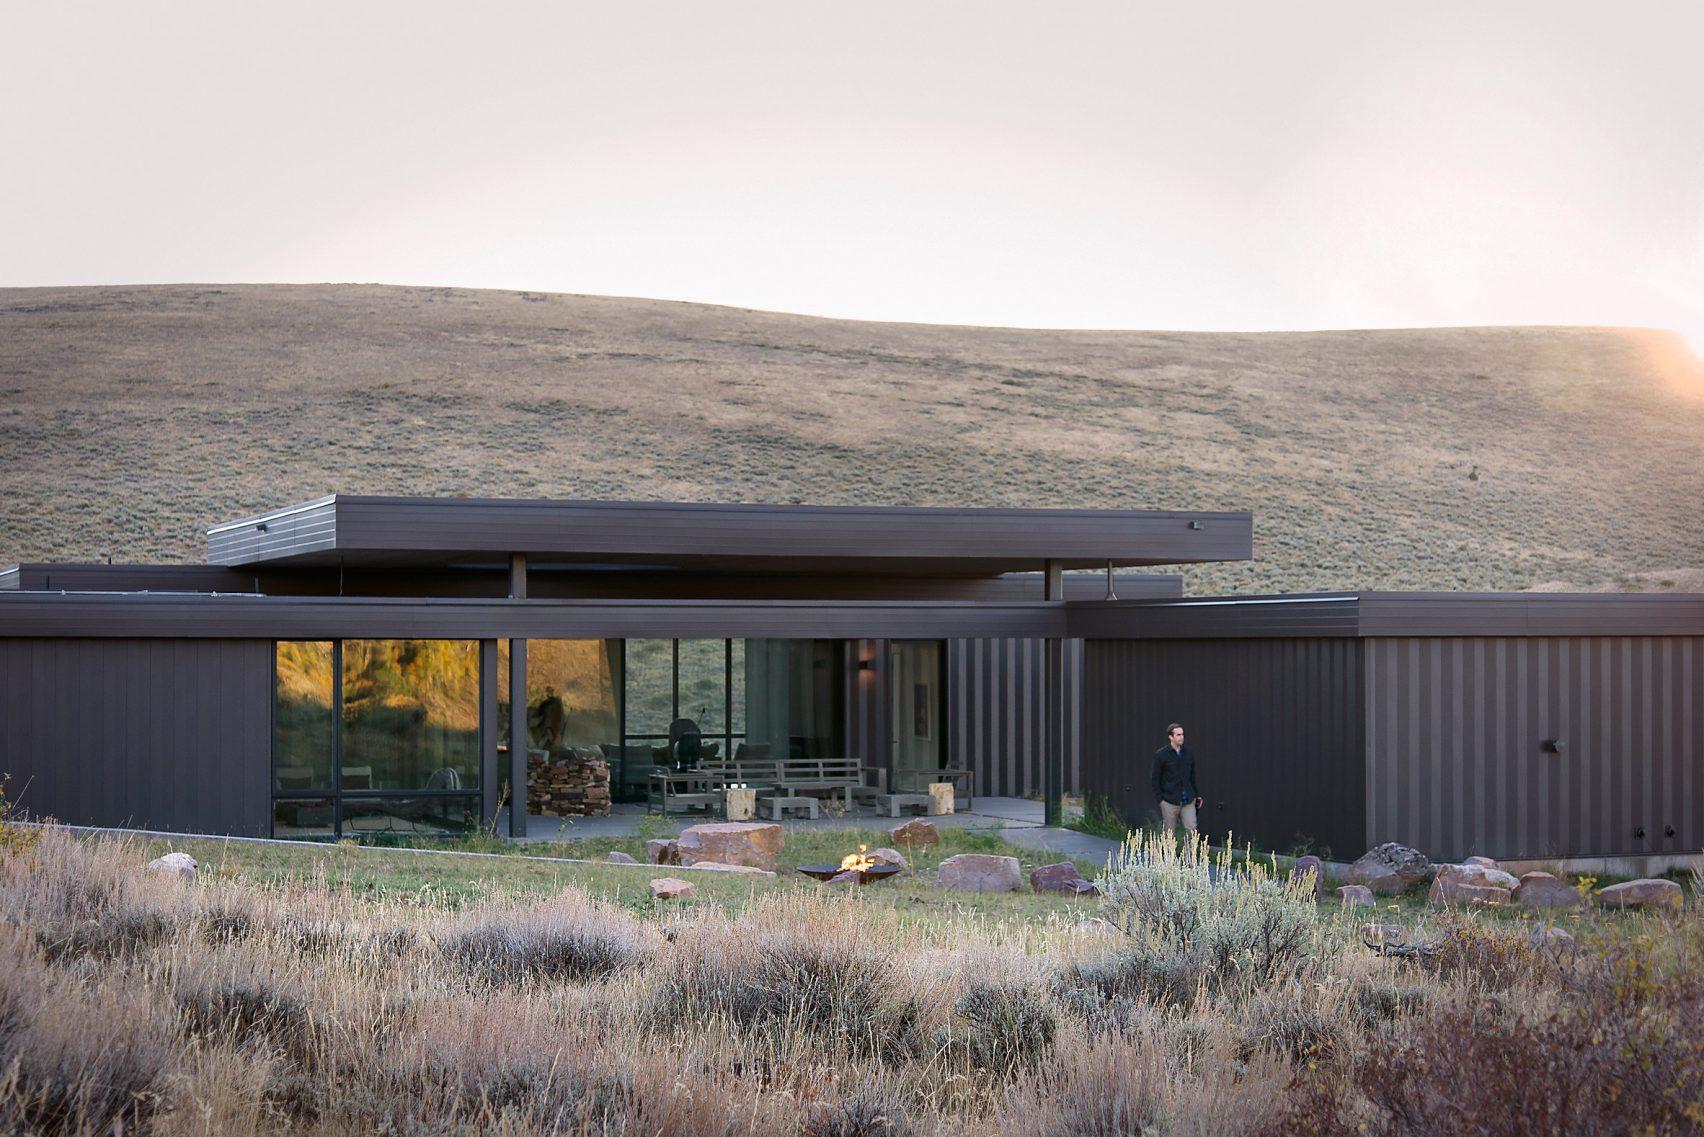 Exteriores de la vivienda / Imbue Design